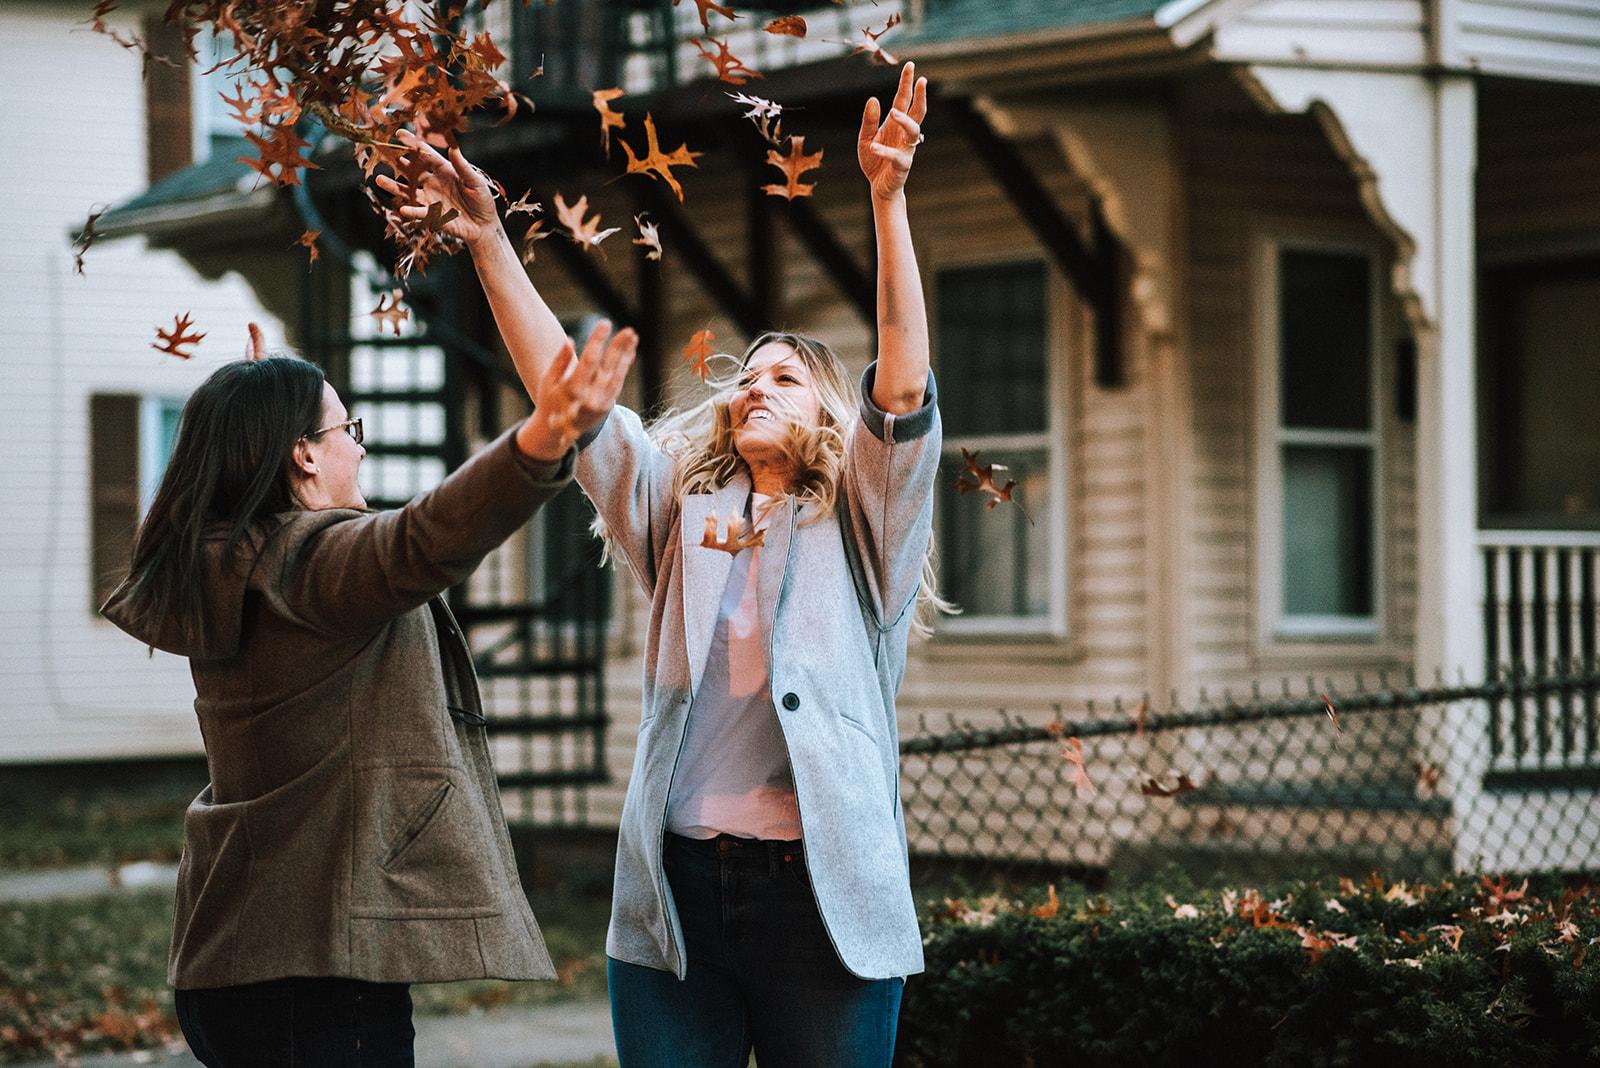 Evergreen Weddings photography lesbian woman in love lgbtqia gay Northampton, Massachusetts USA greenhouse garden engagement proposal photos Dancing With Her